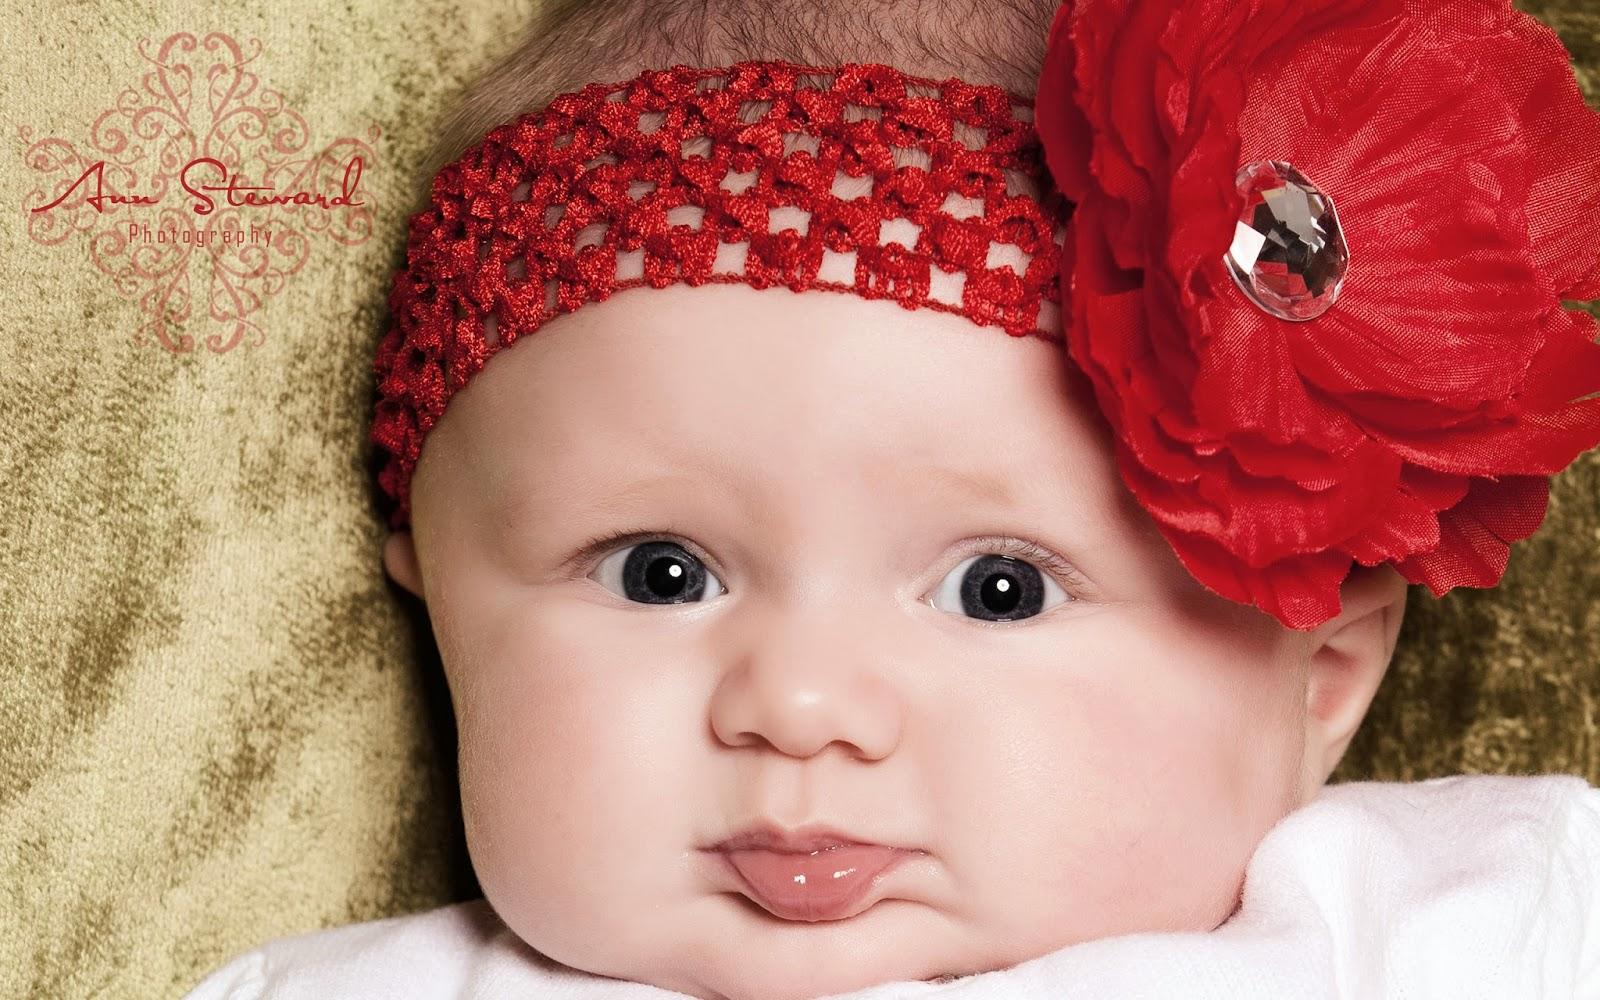 Wallpaper Lucu Bayi Perempuan Gambar Kartun Lucu Dan - Beautiful Cute Babies - HD Wallpaper